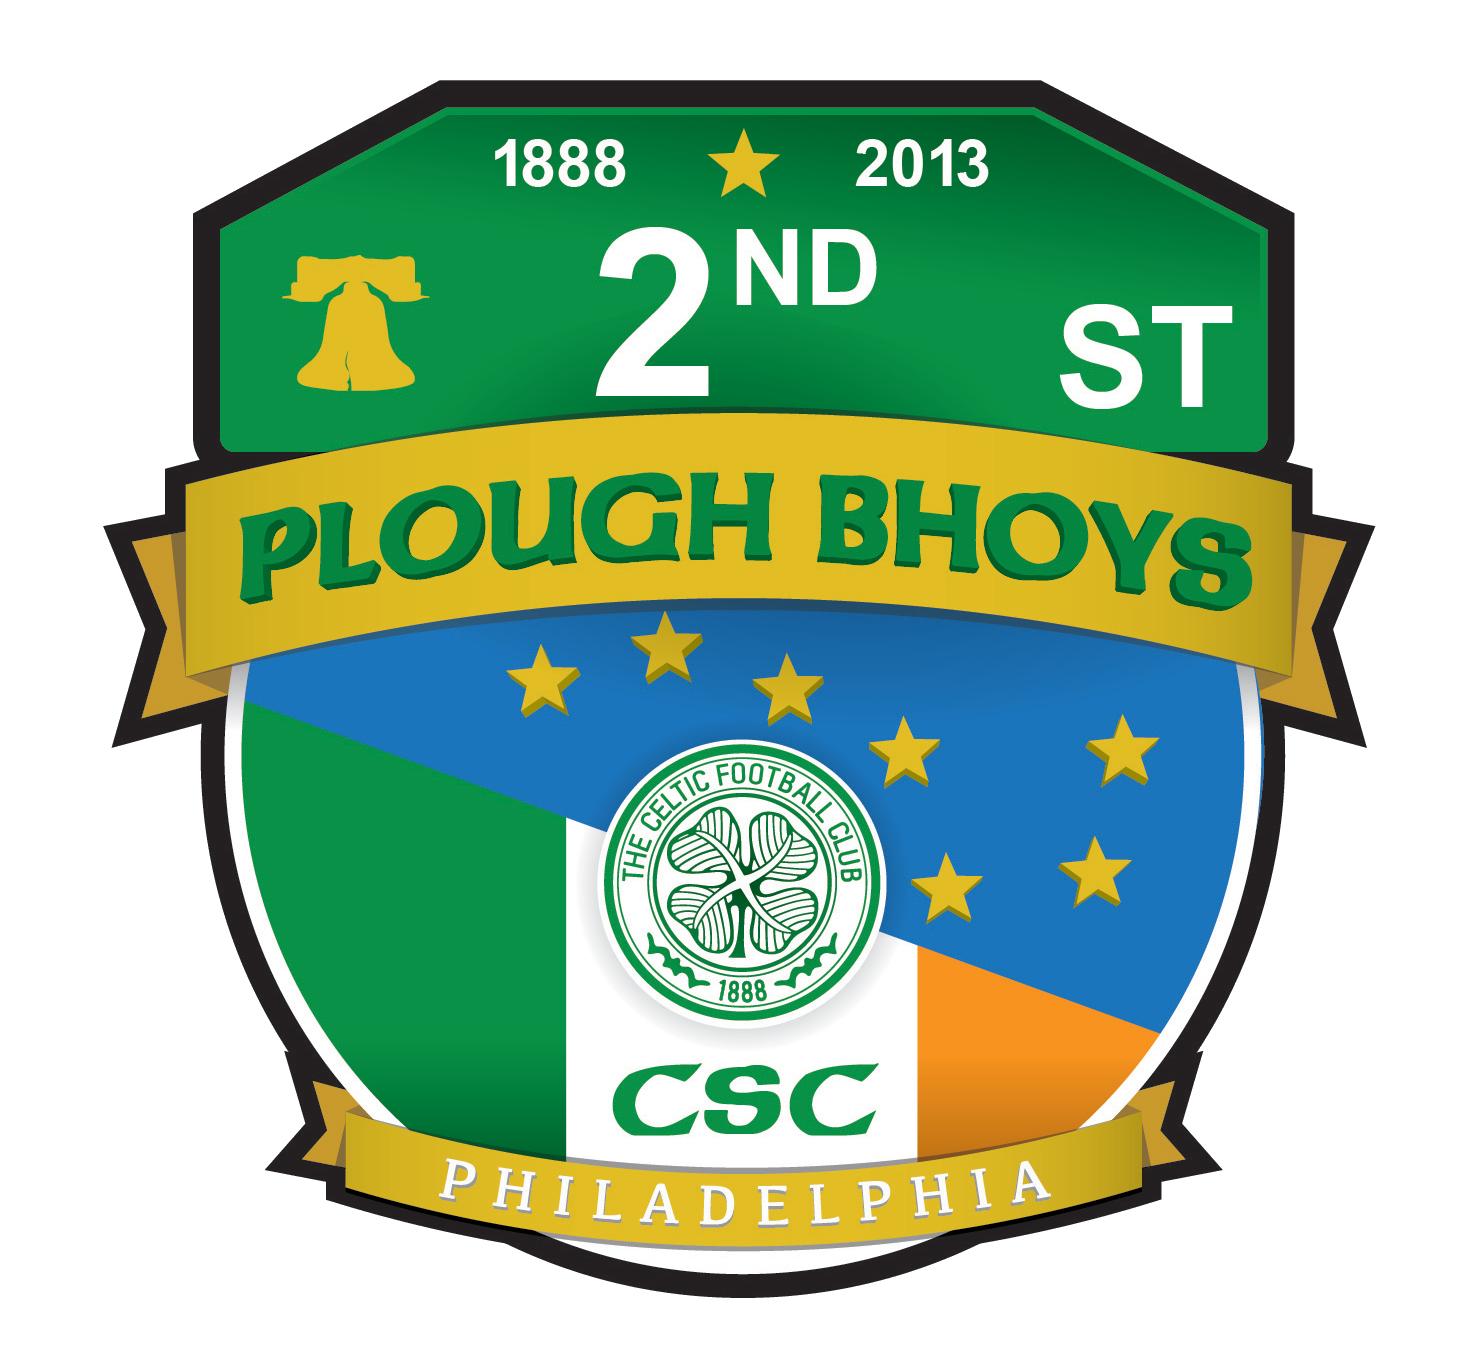 2nd Street Plough Bhoys CSC